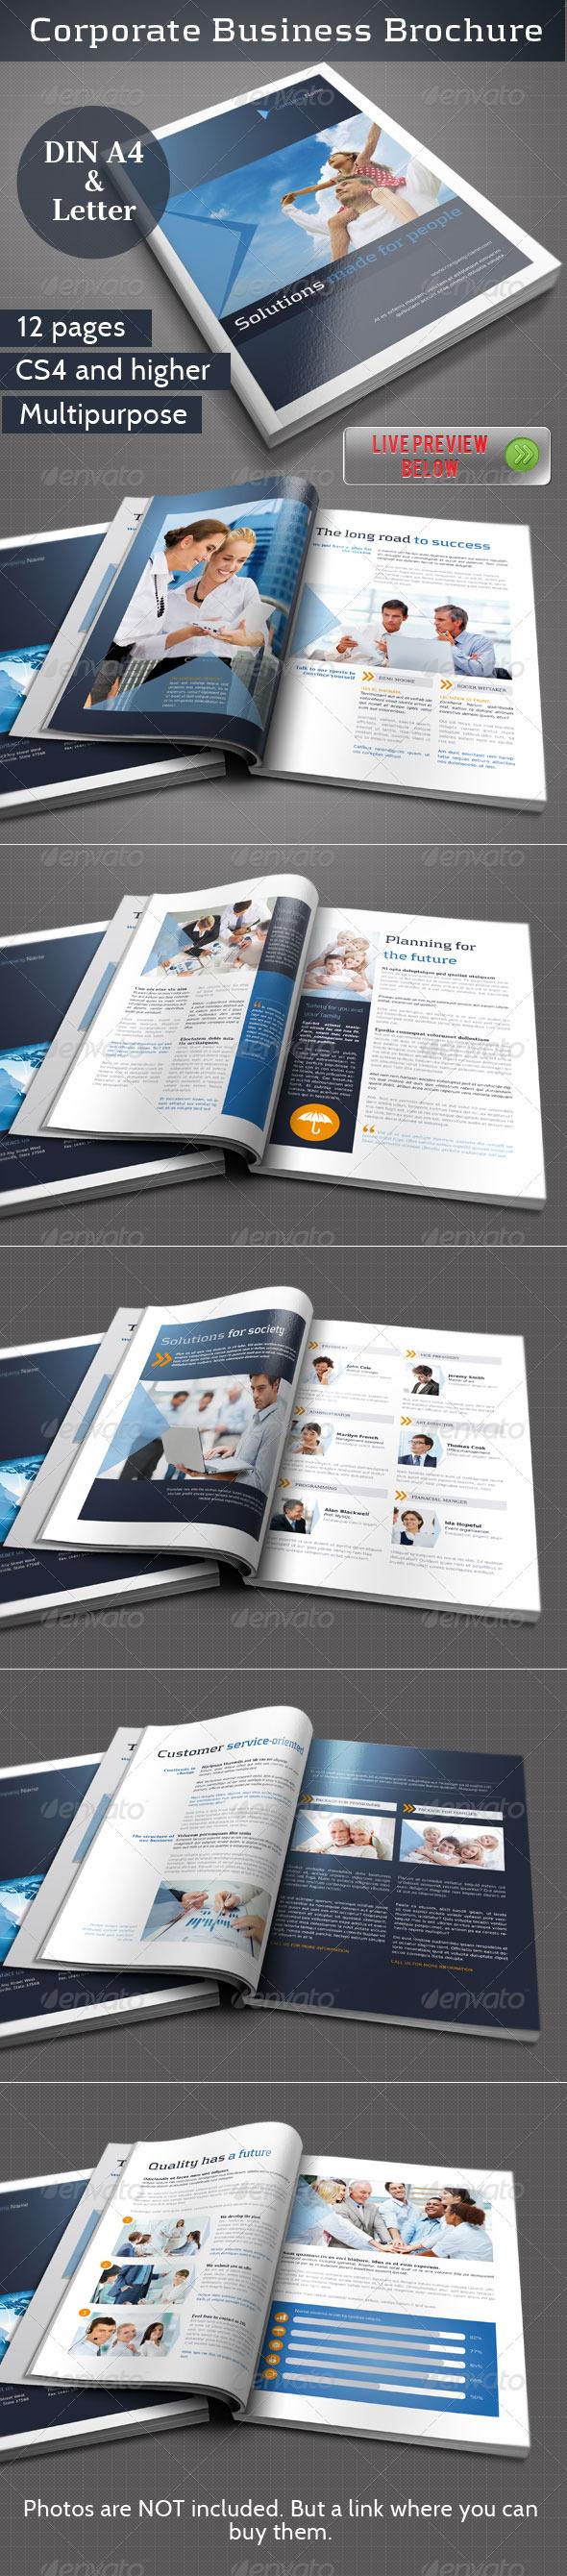 GraphicRiver Corporate Business Brochure Vol II 3160634